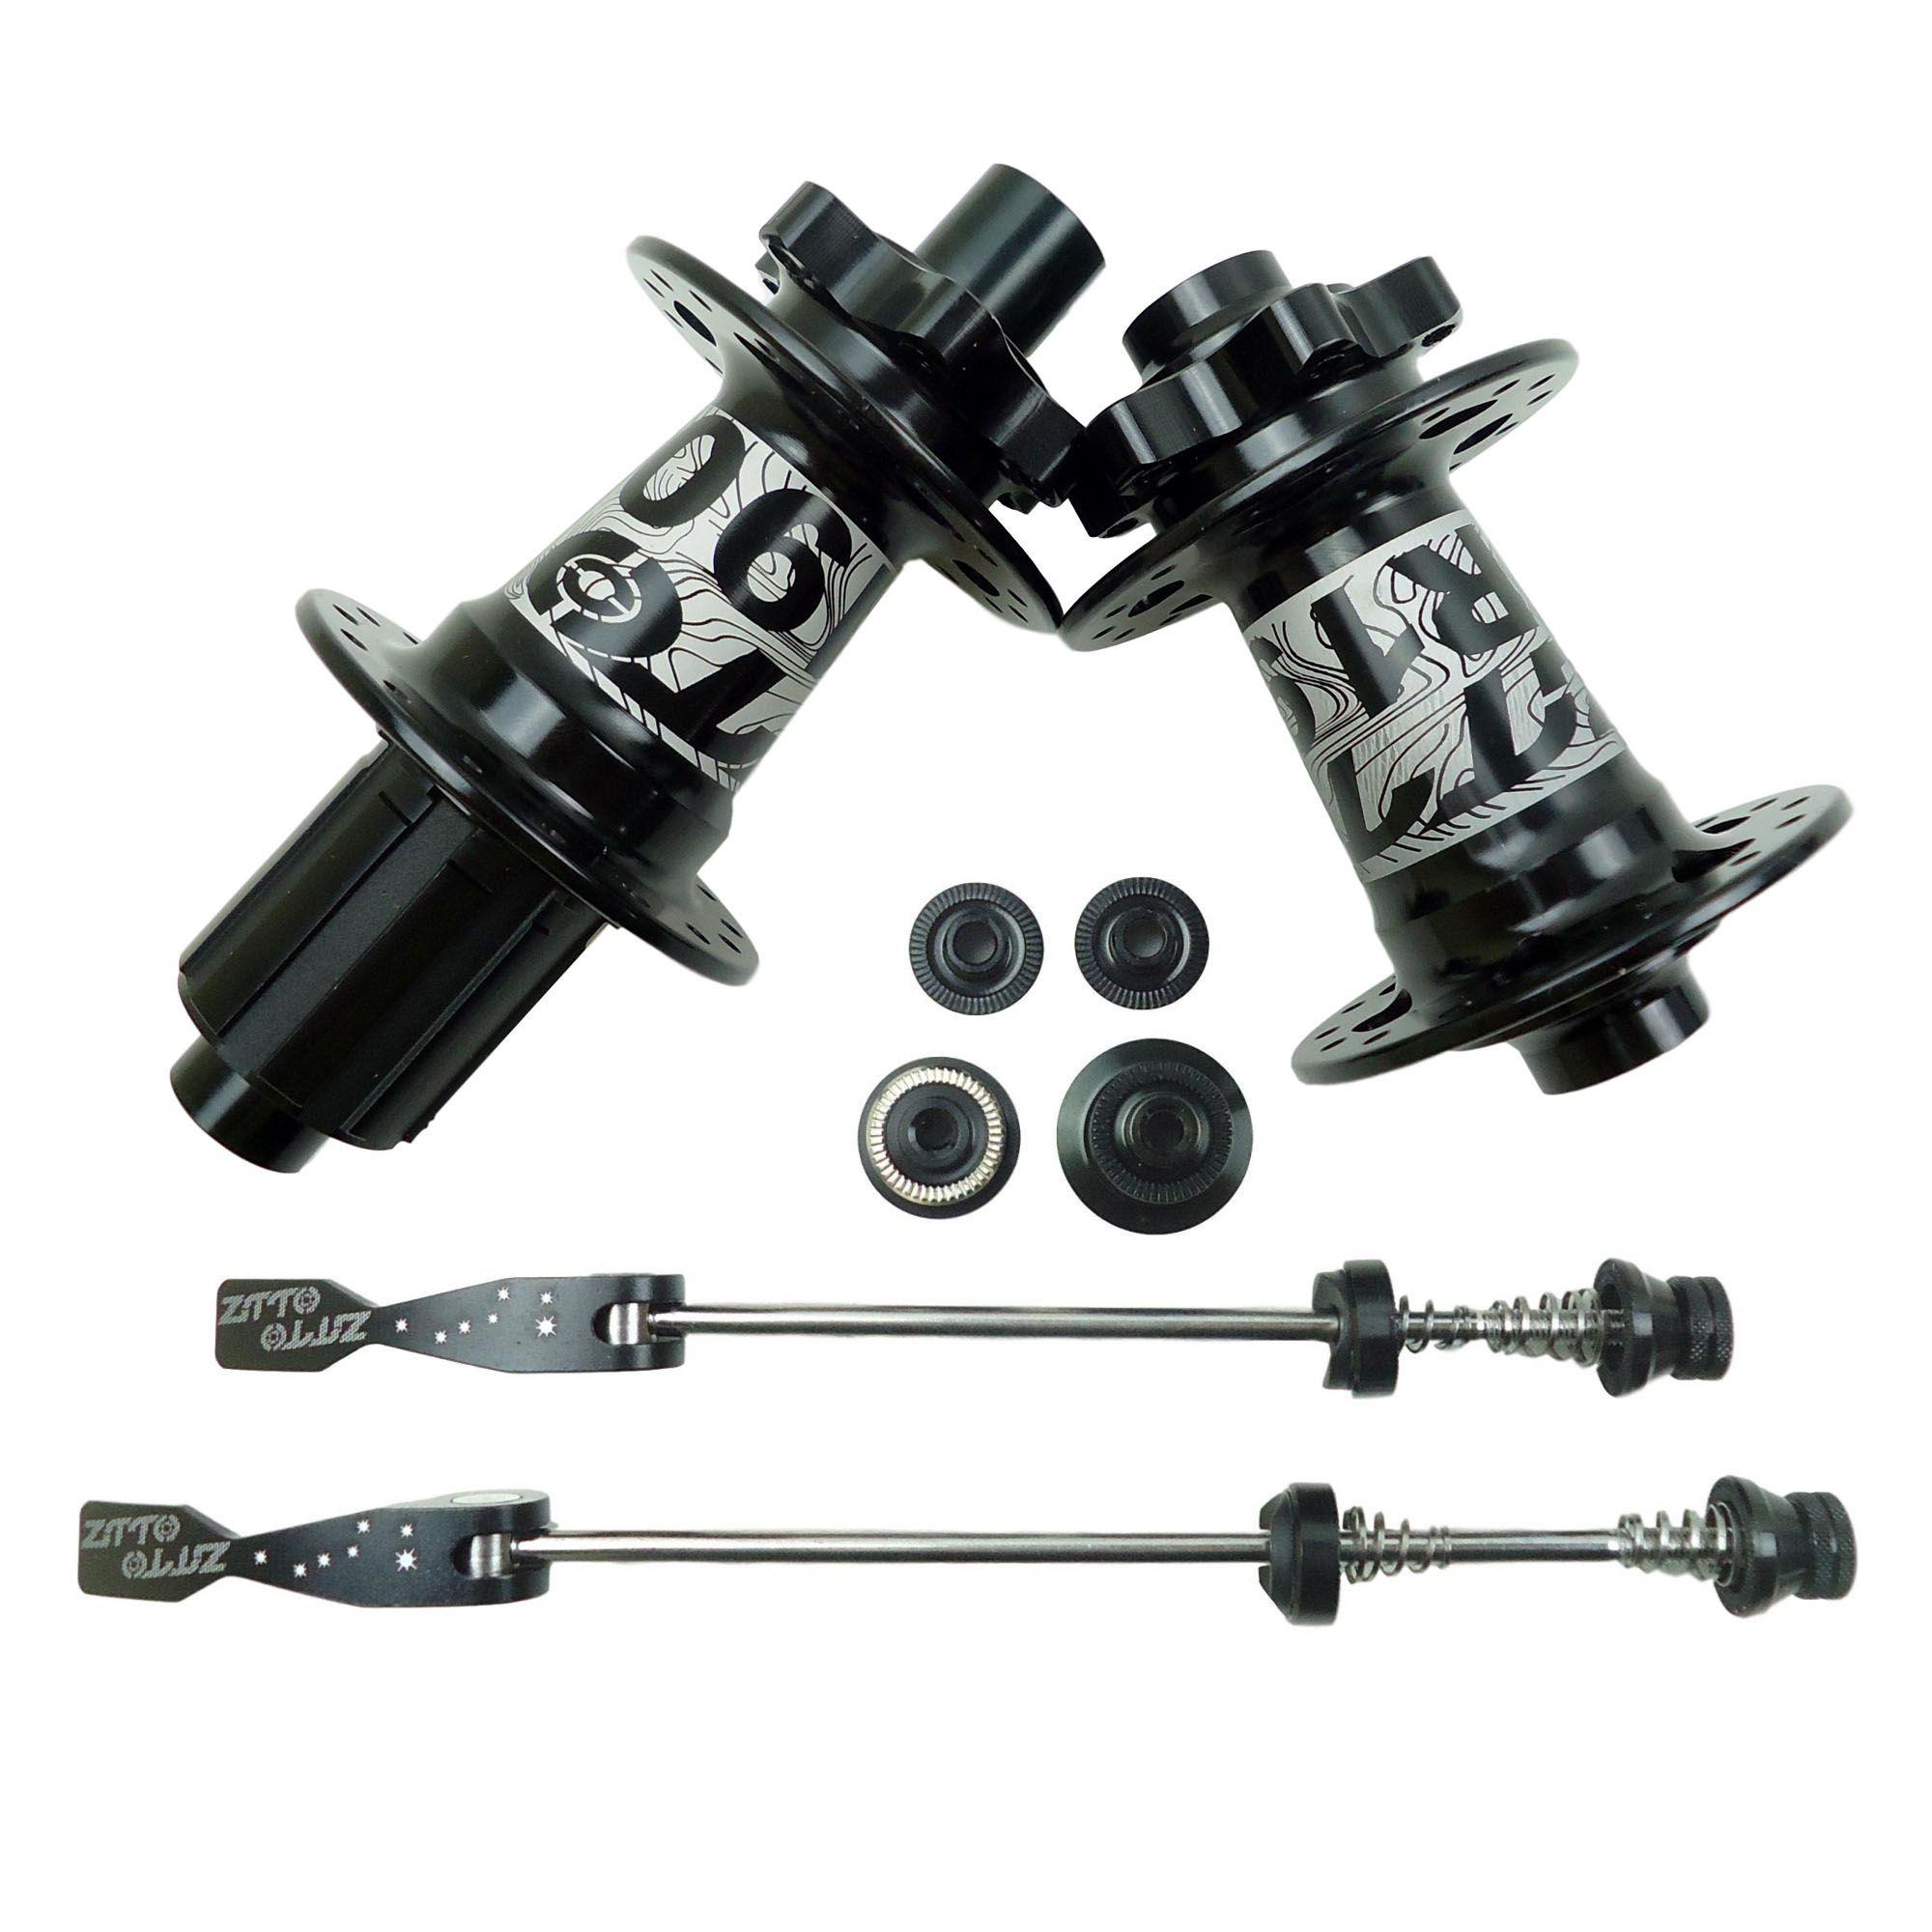 Par de Cubos ZTTO DR190 Shimano 32 Furos Eixo Normal ou 142mm Sistema Ratchet Igual DT Swiss